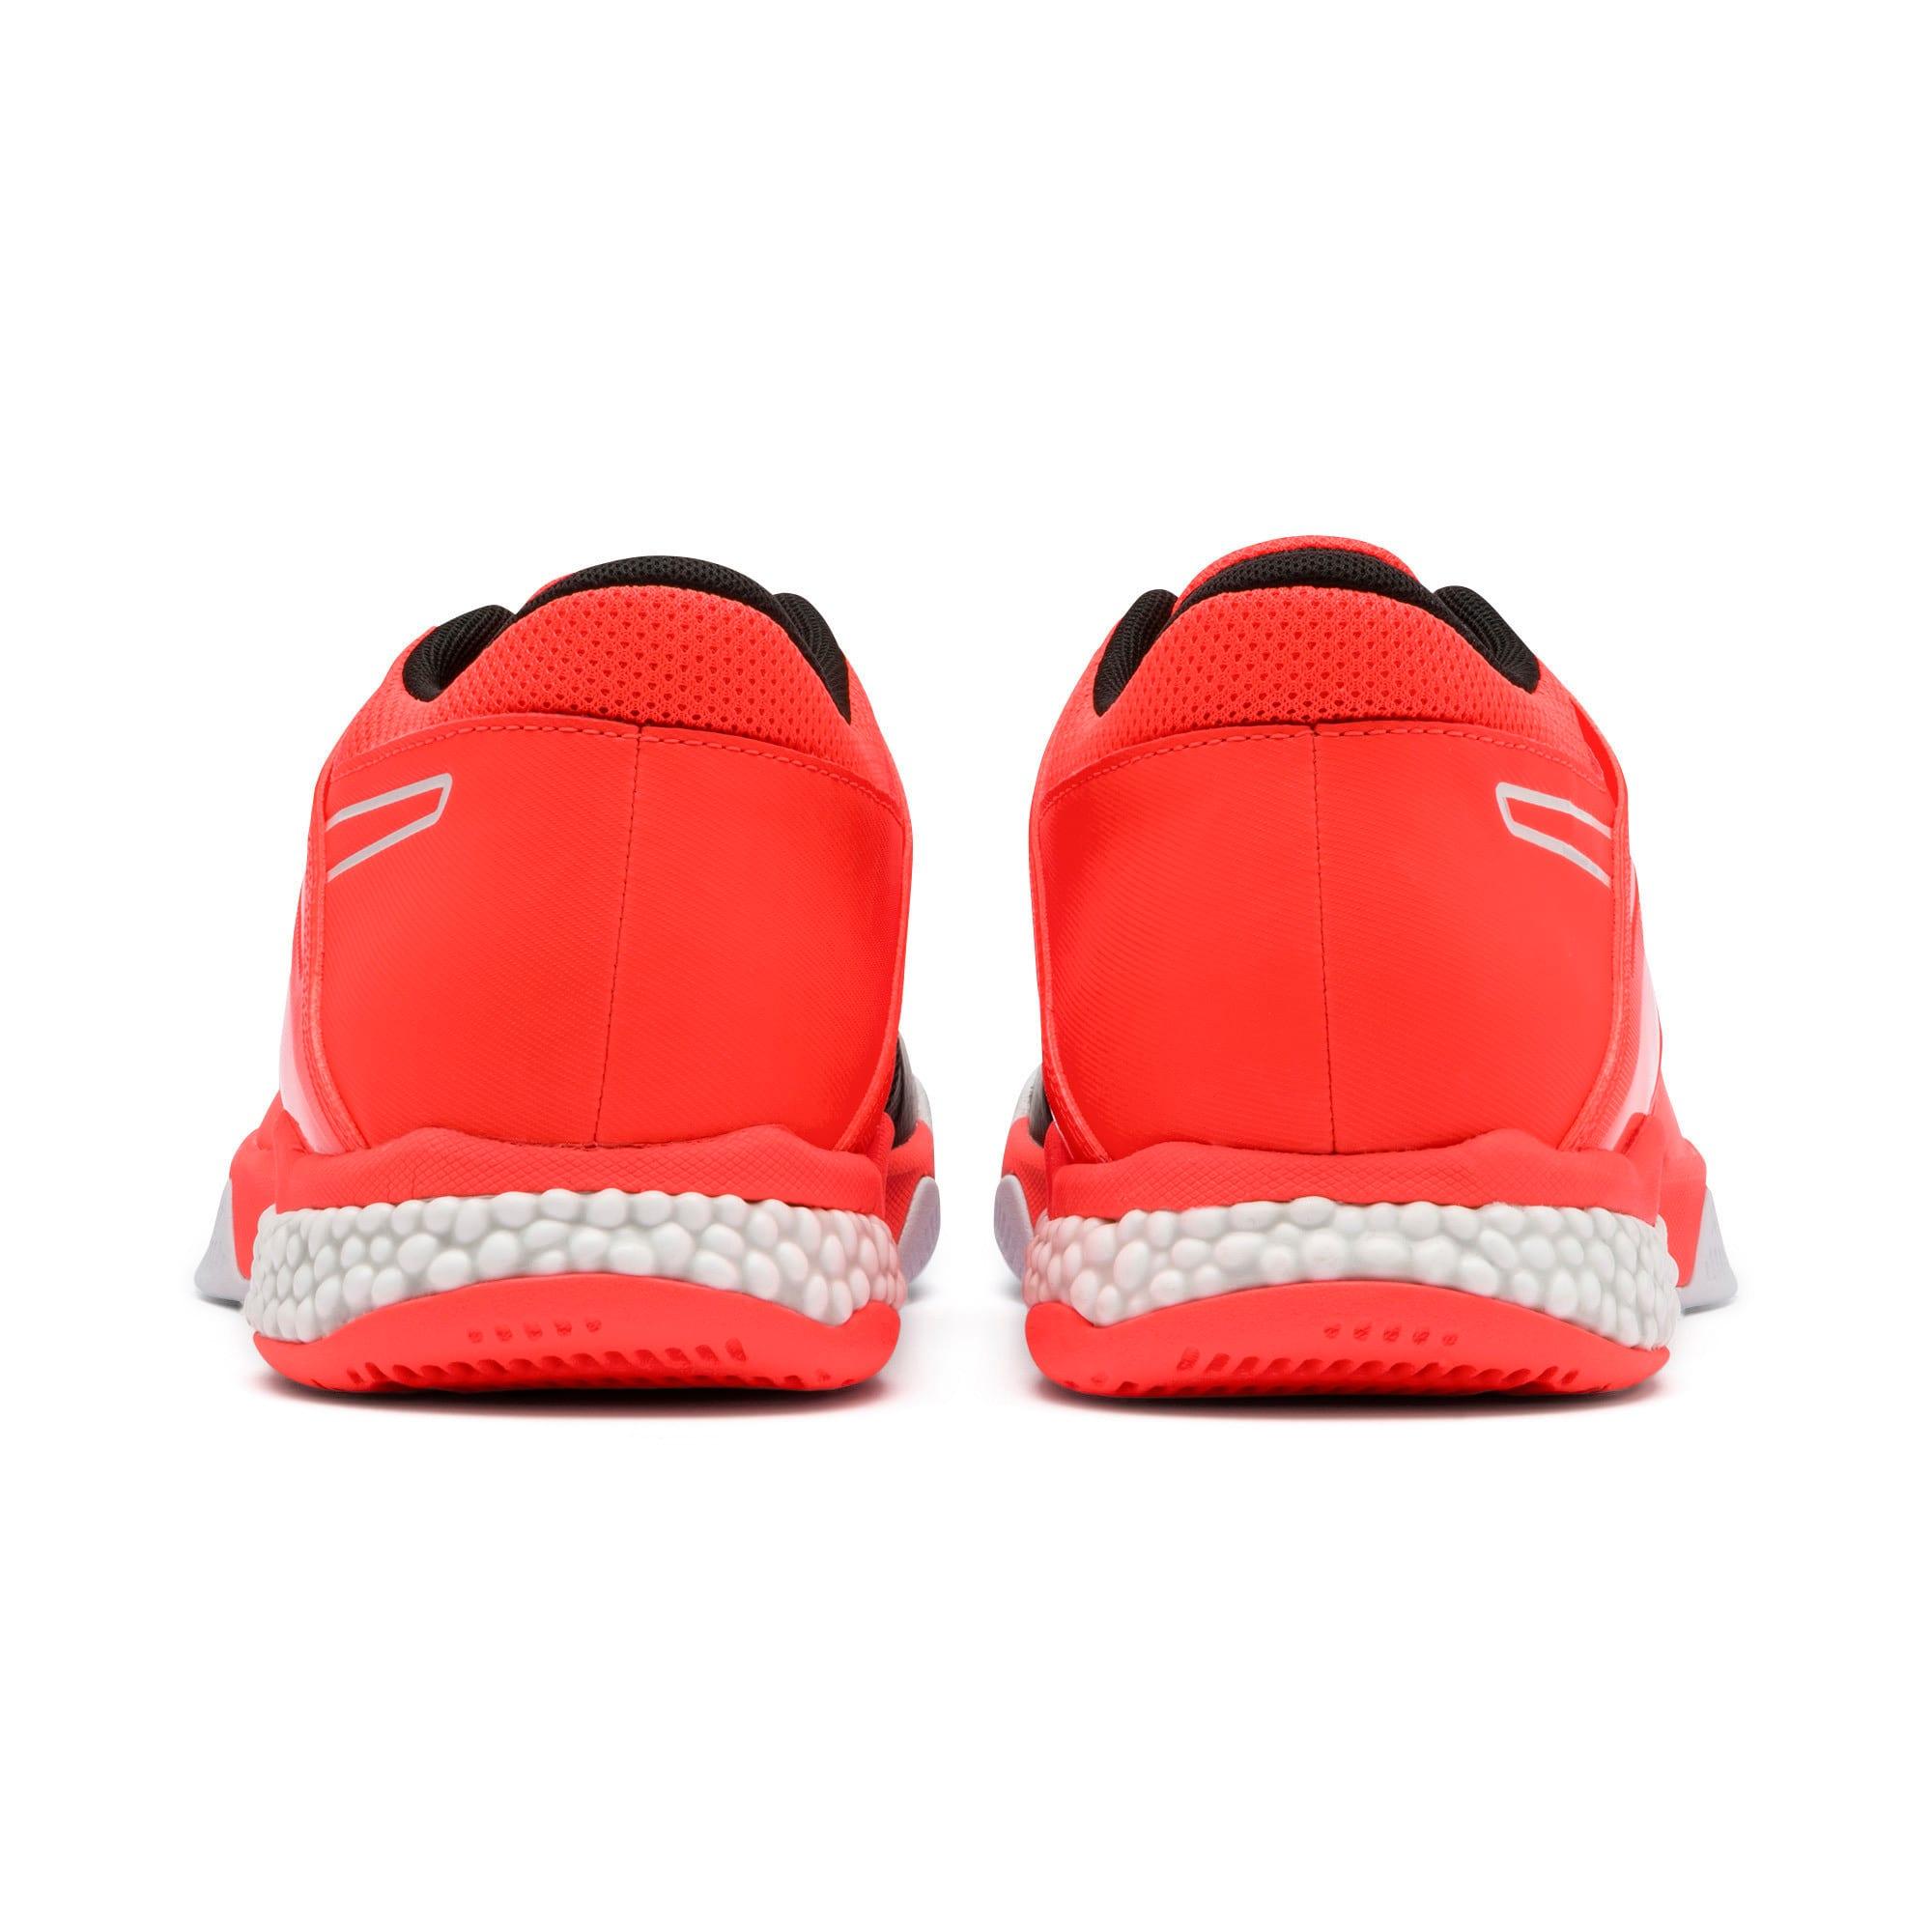 Thumbnail 4 of Chaussures Handball Explode XT Hybrid 2 Training, Black-Puma White-Nrgy Red, medium